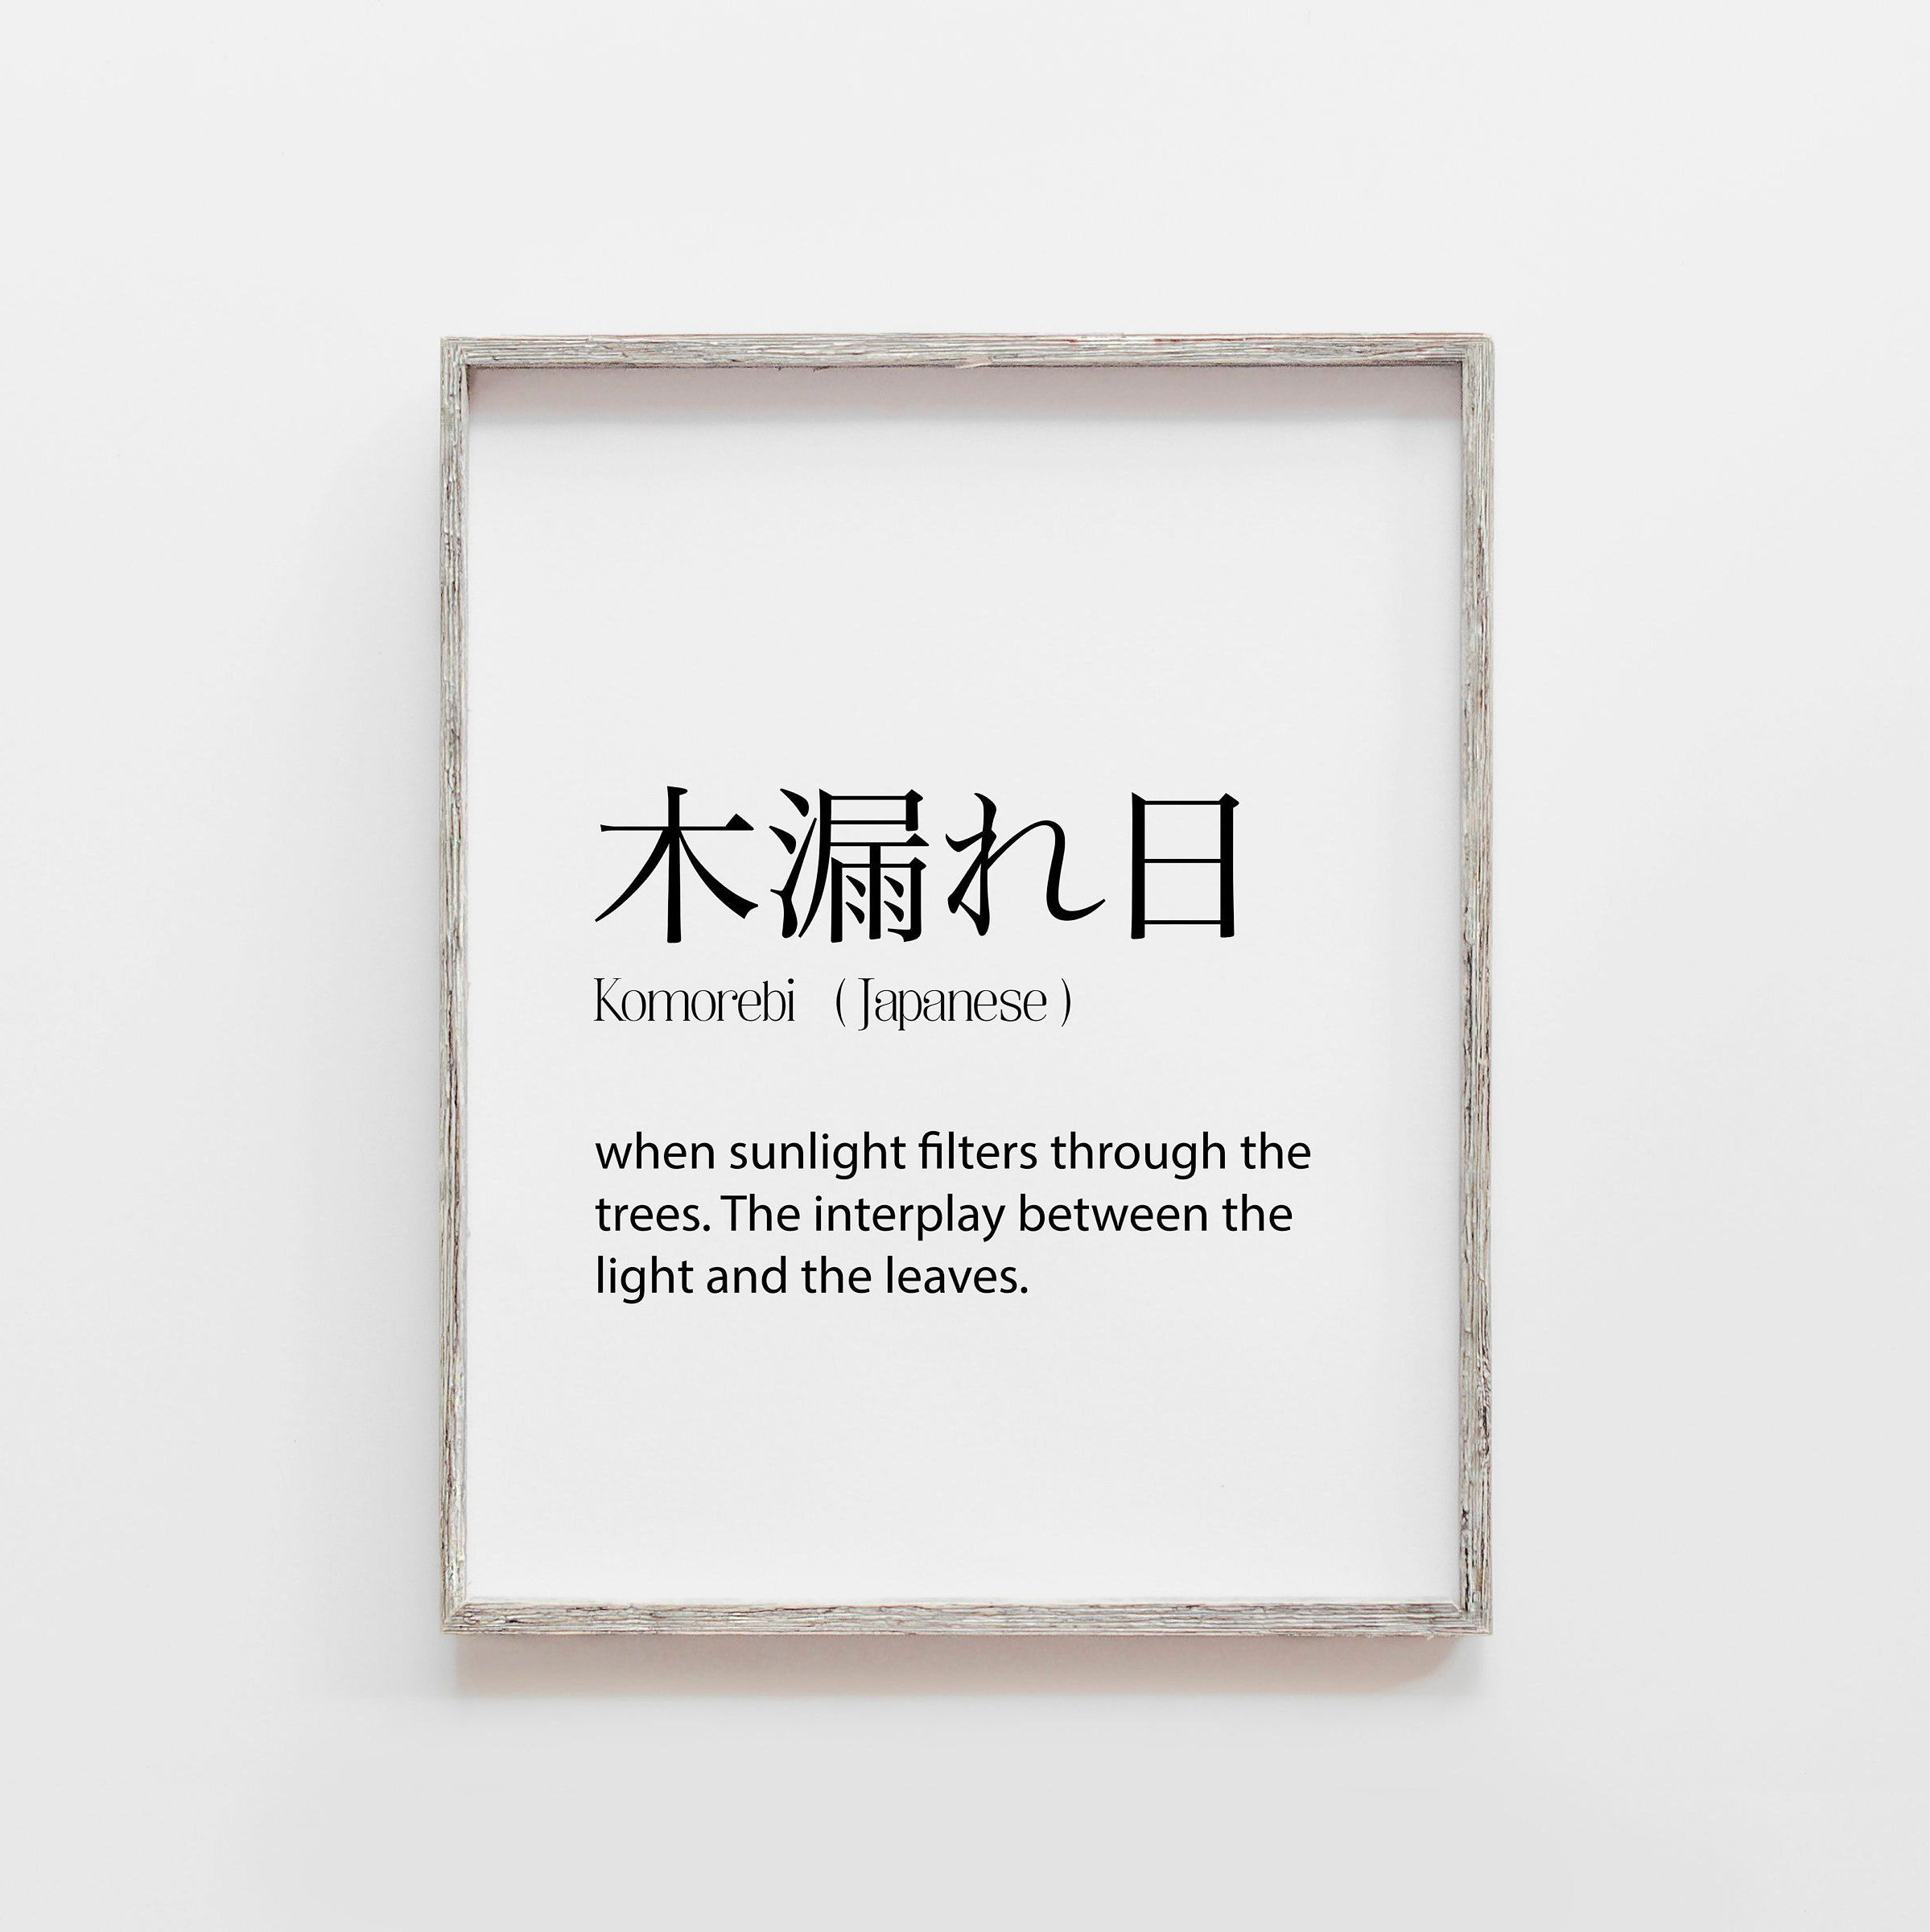 Japanese Print Japanese Gifts Komorebi Definition Printable Etsy In 2020 Japanese Wall Decor Japanese Wall Aesthetic Words